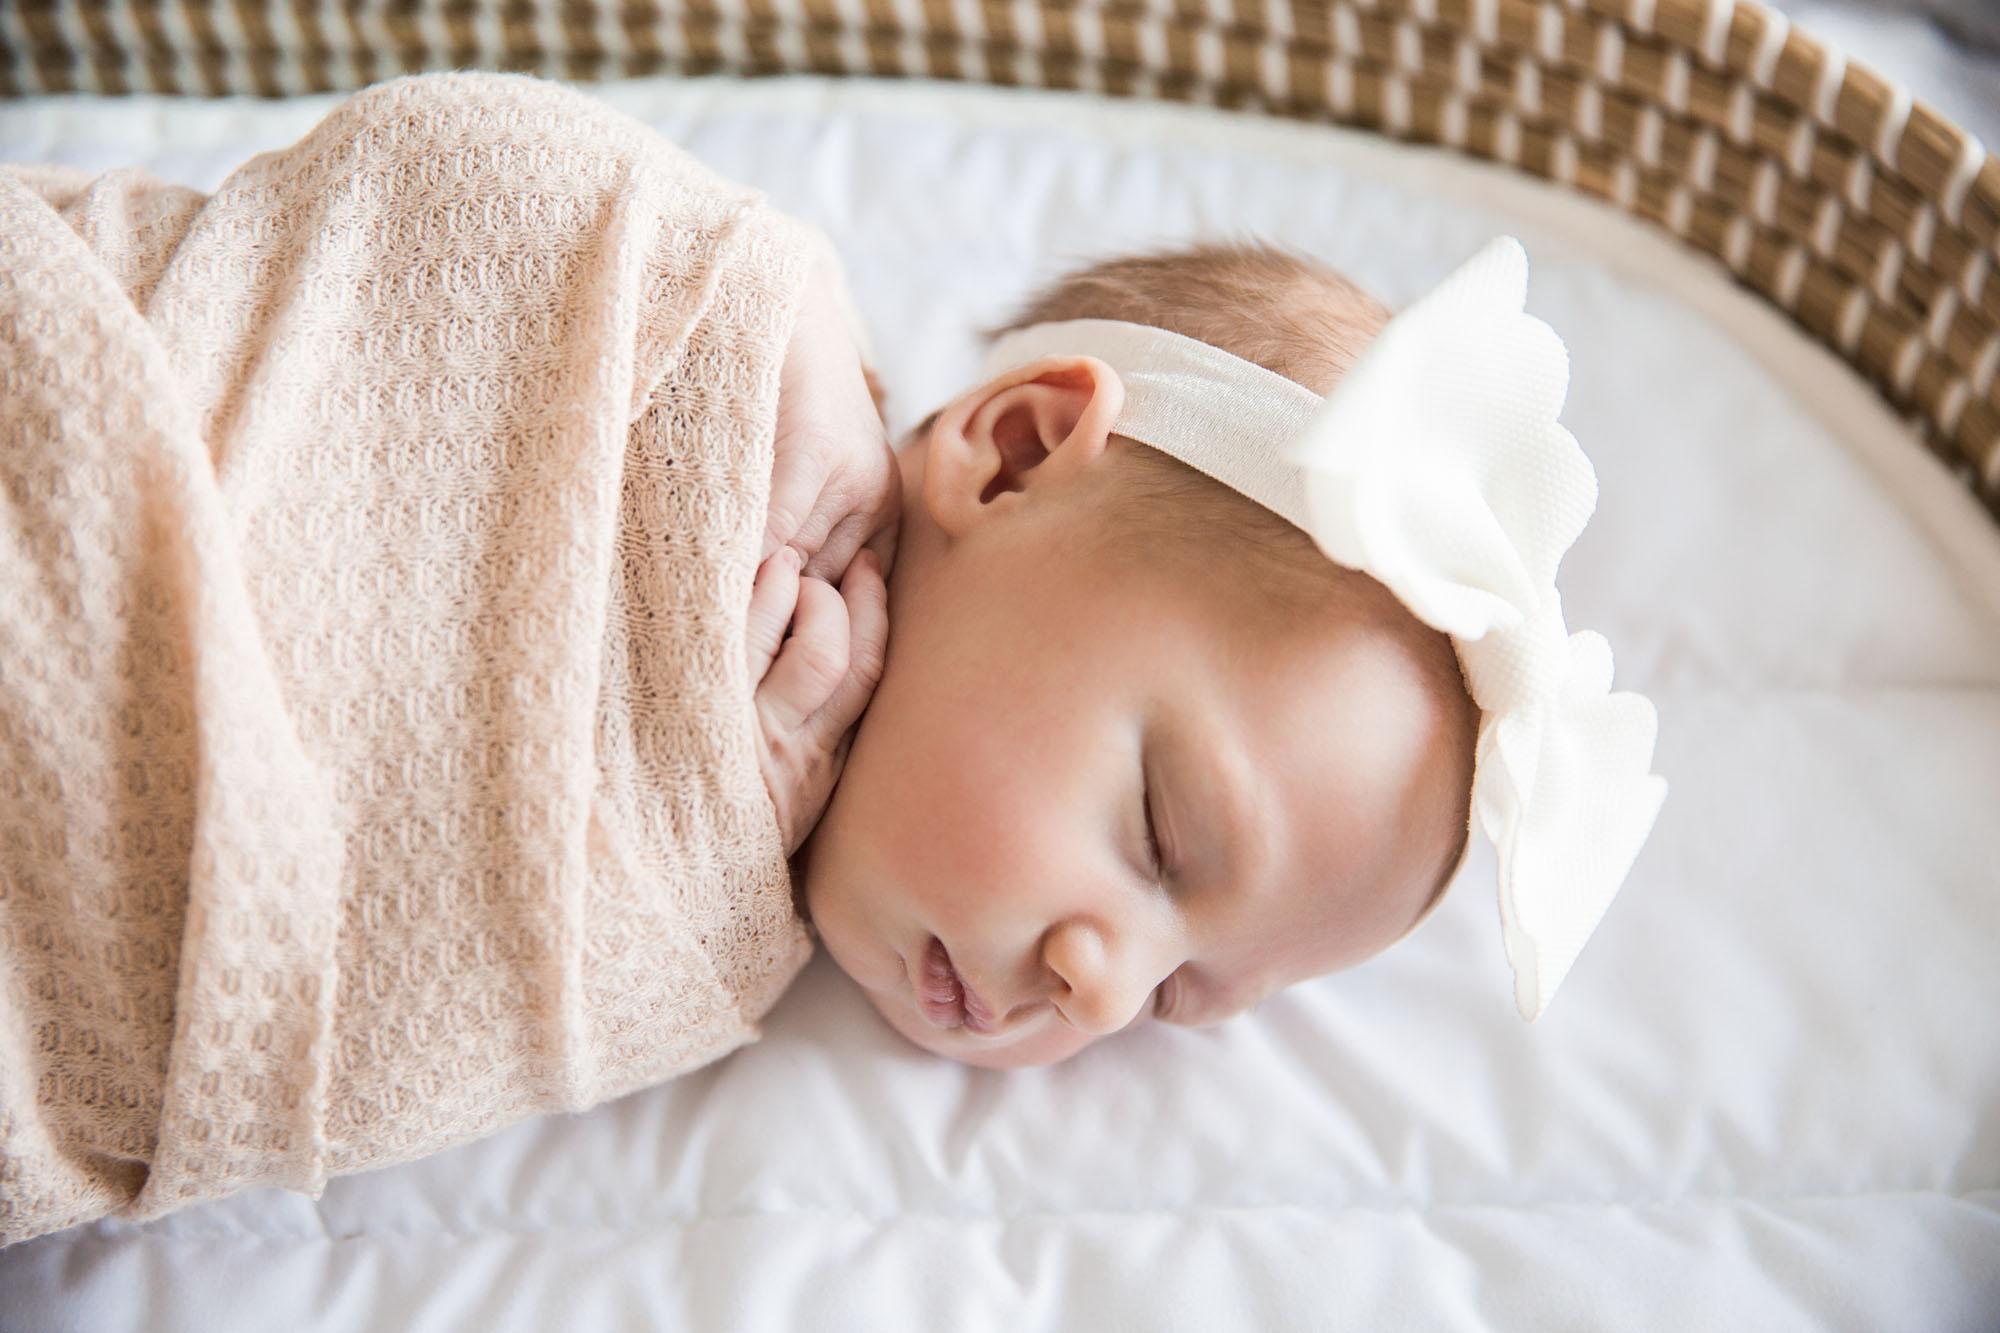 Calgary lifestyle family and newborn photographer, in-home newborn photos